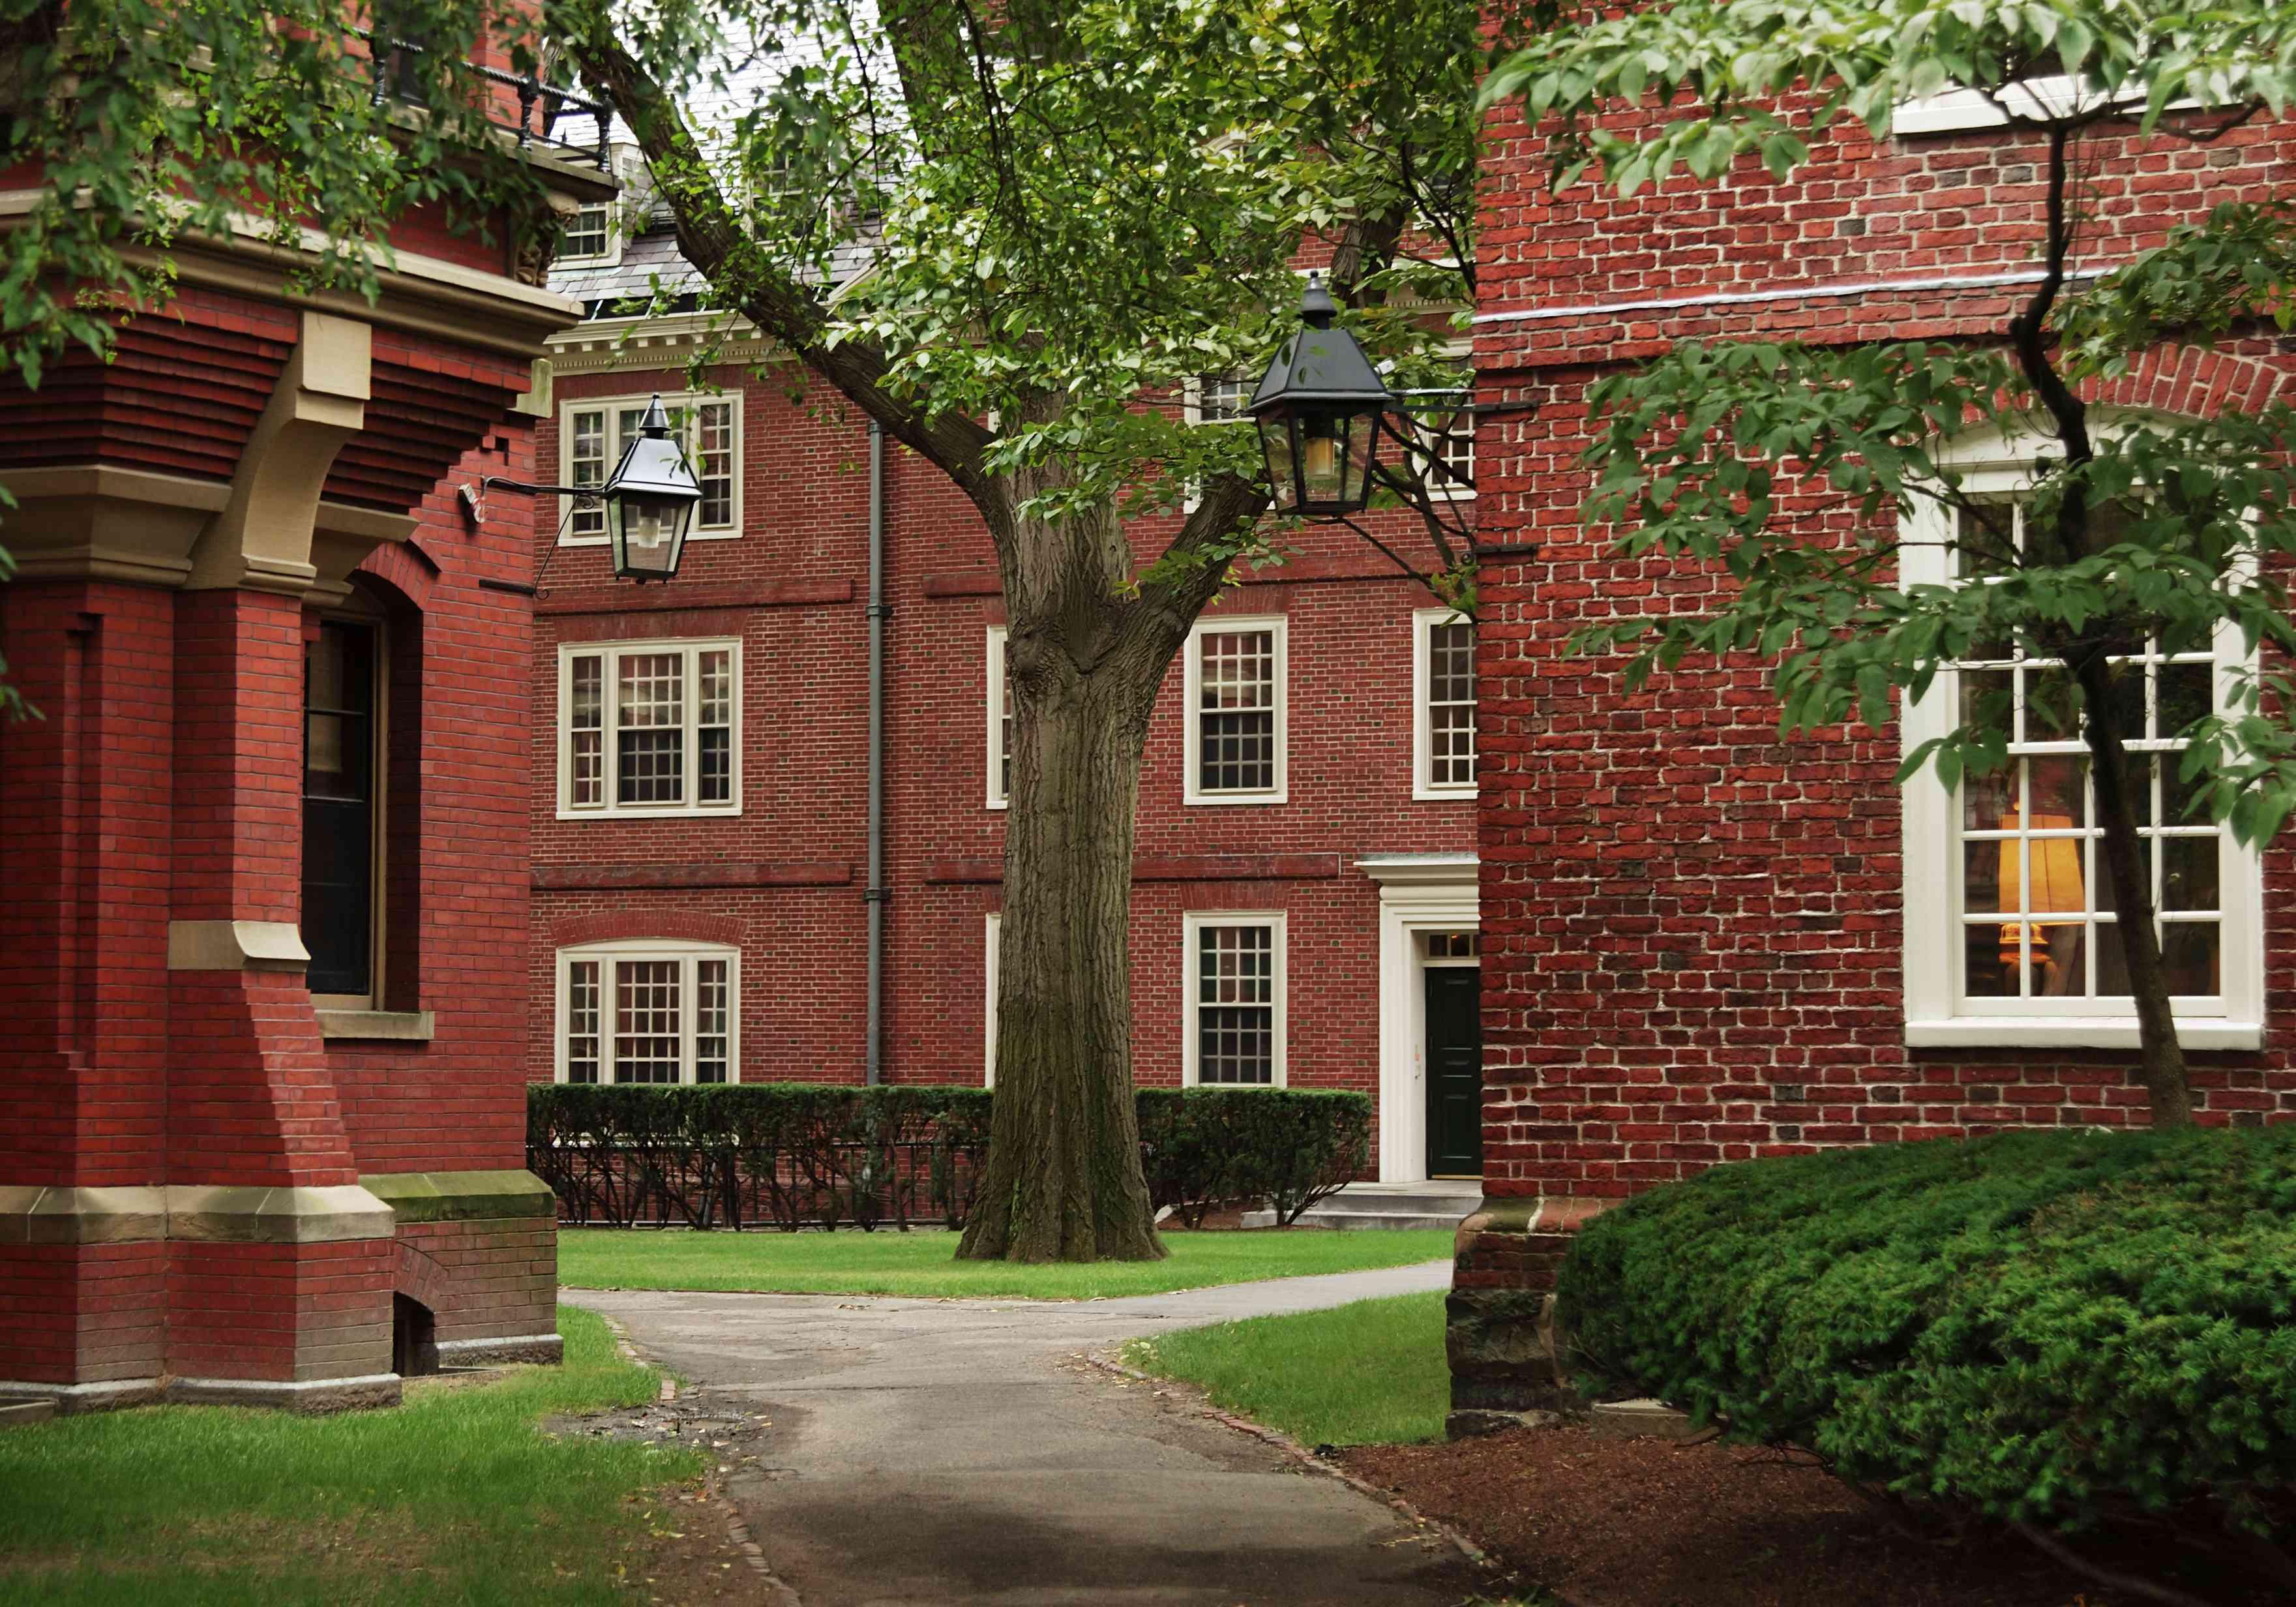 University campus at Harvard